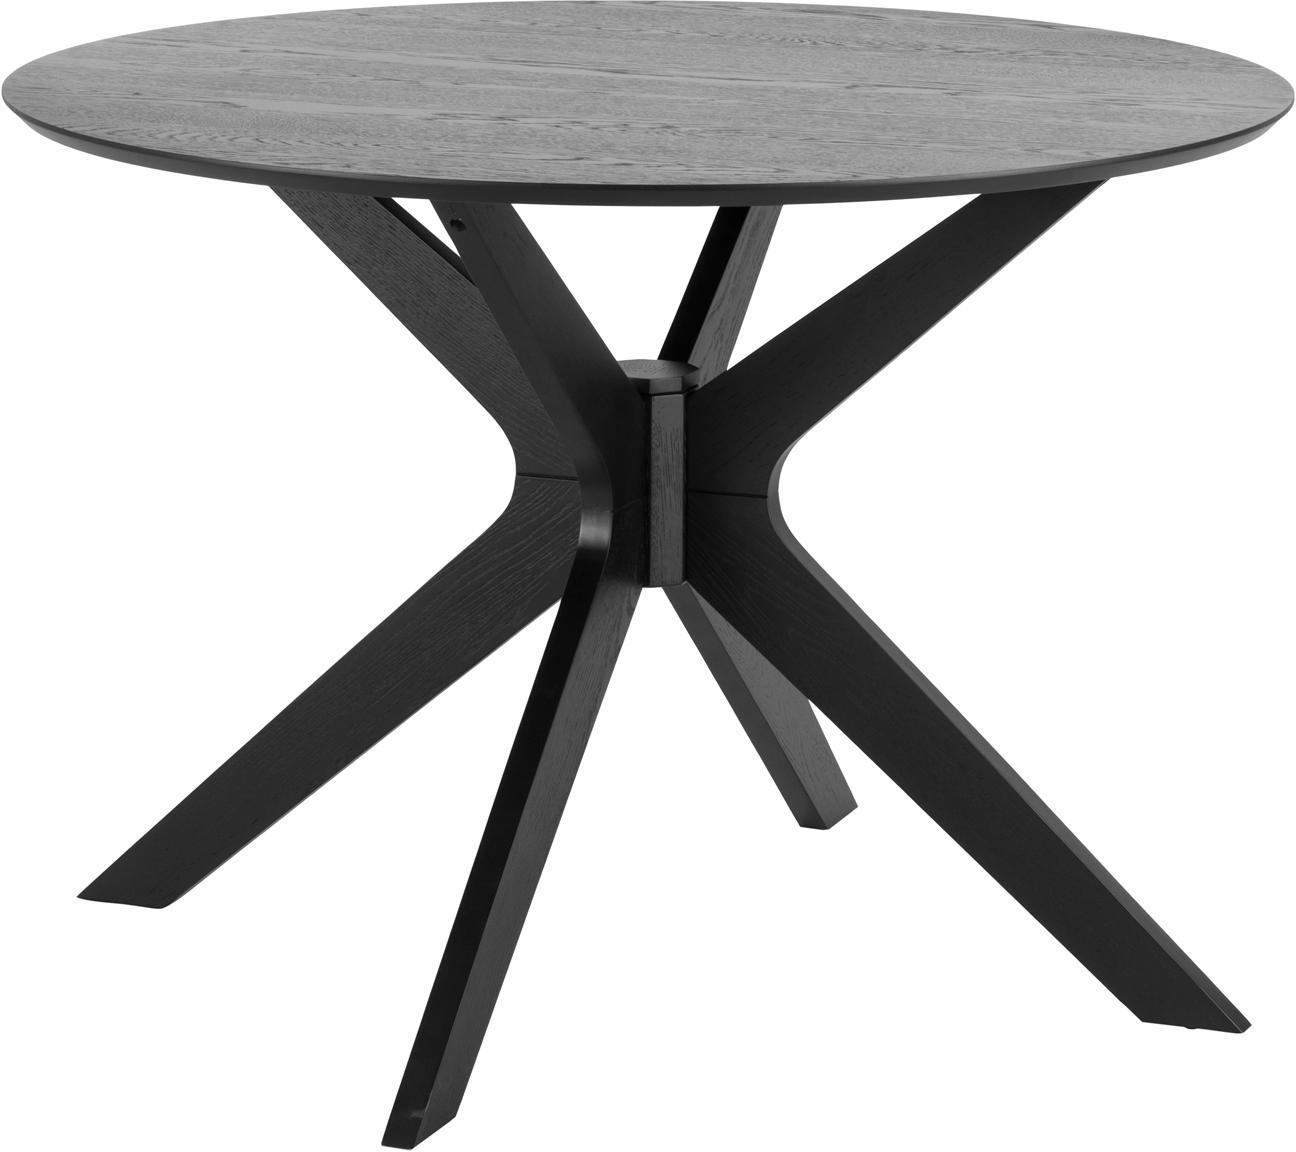 Mesa de comedor redonda Duncan aus roble, Tablero: fibras de densidad media , Negro, Ø 20 cm